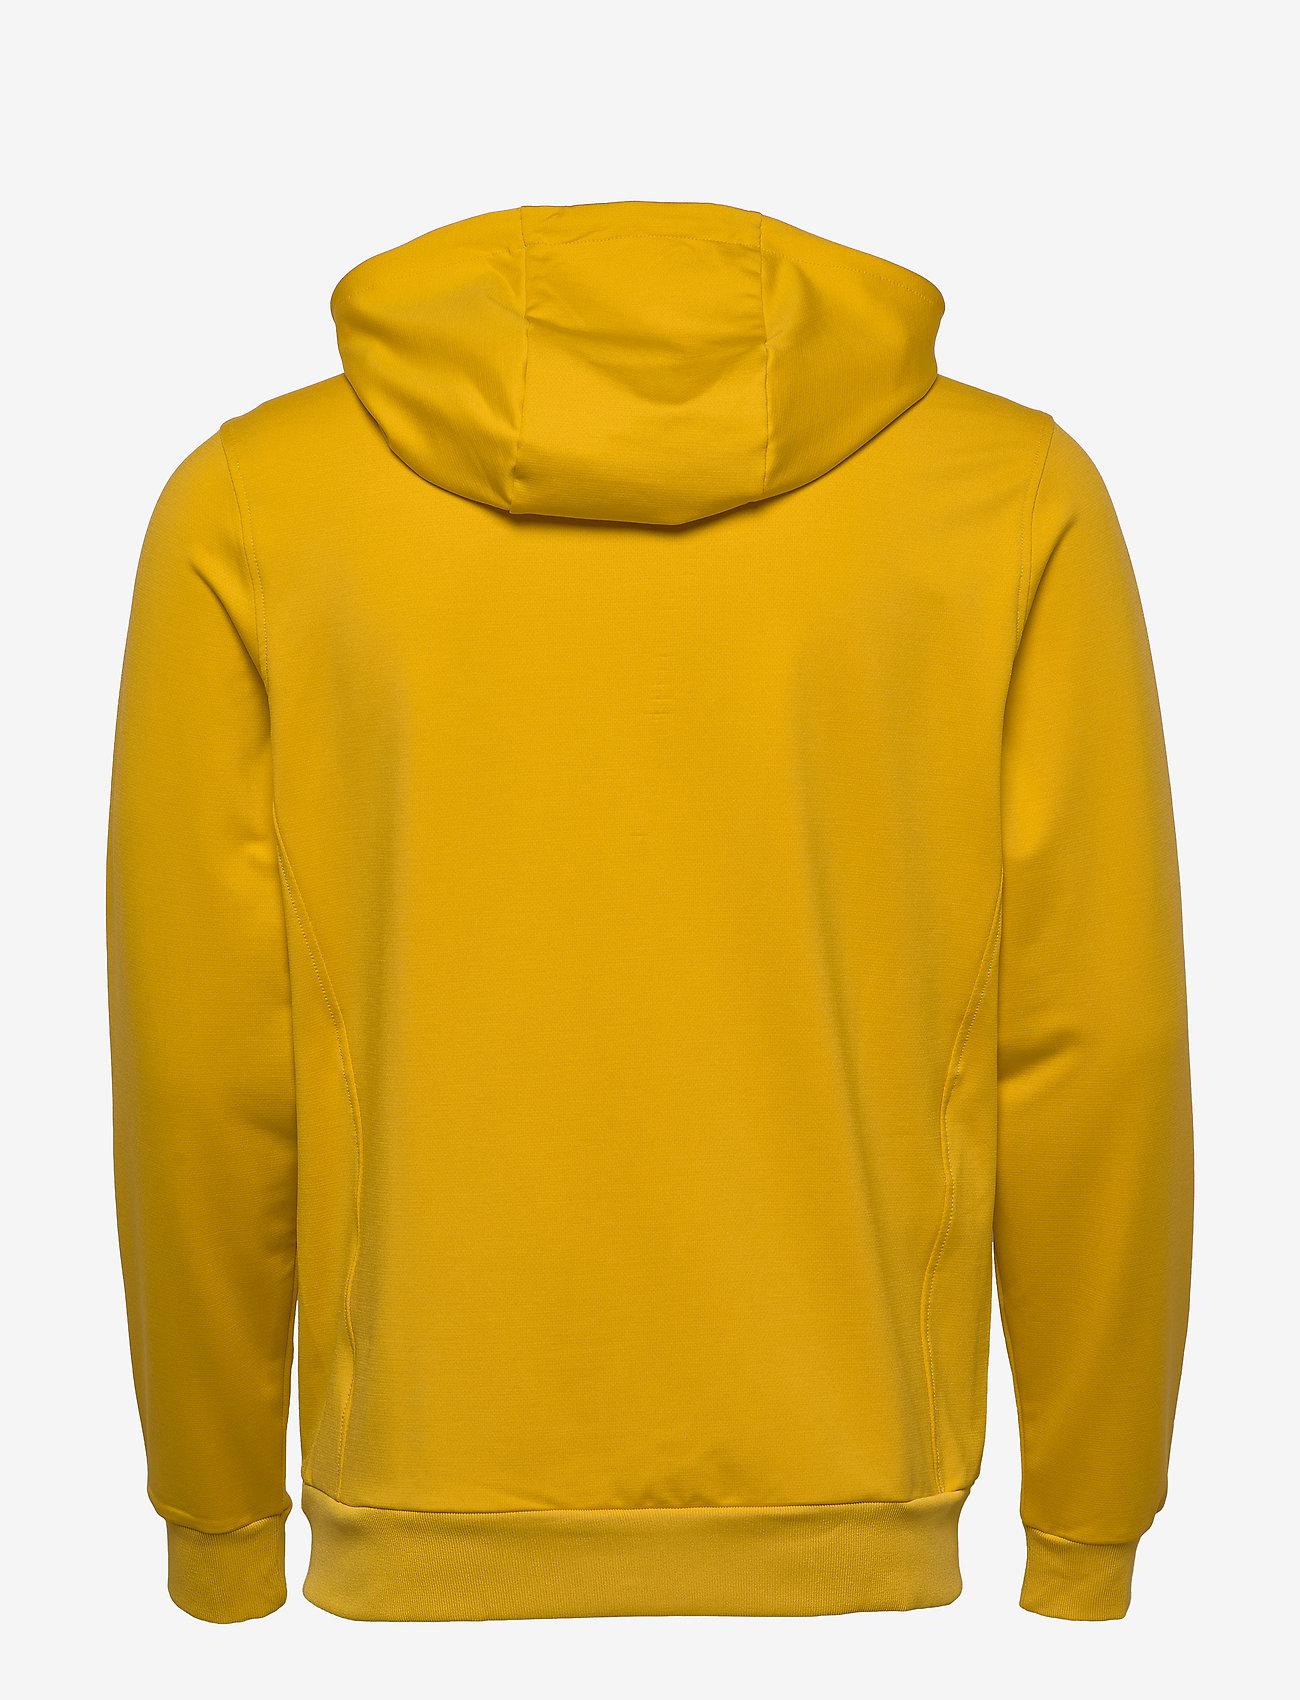 Superwick Full Zip Midlayer (Burnt Yellow) - Lyle & Scott Sport ob1NSQ